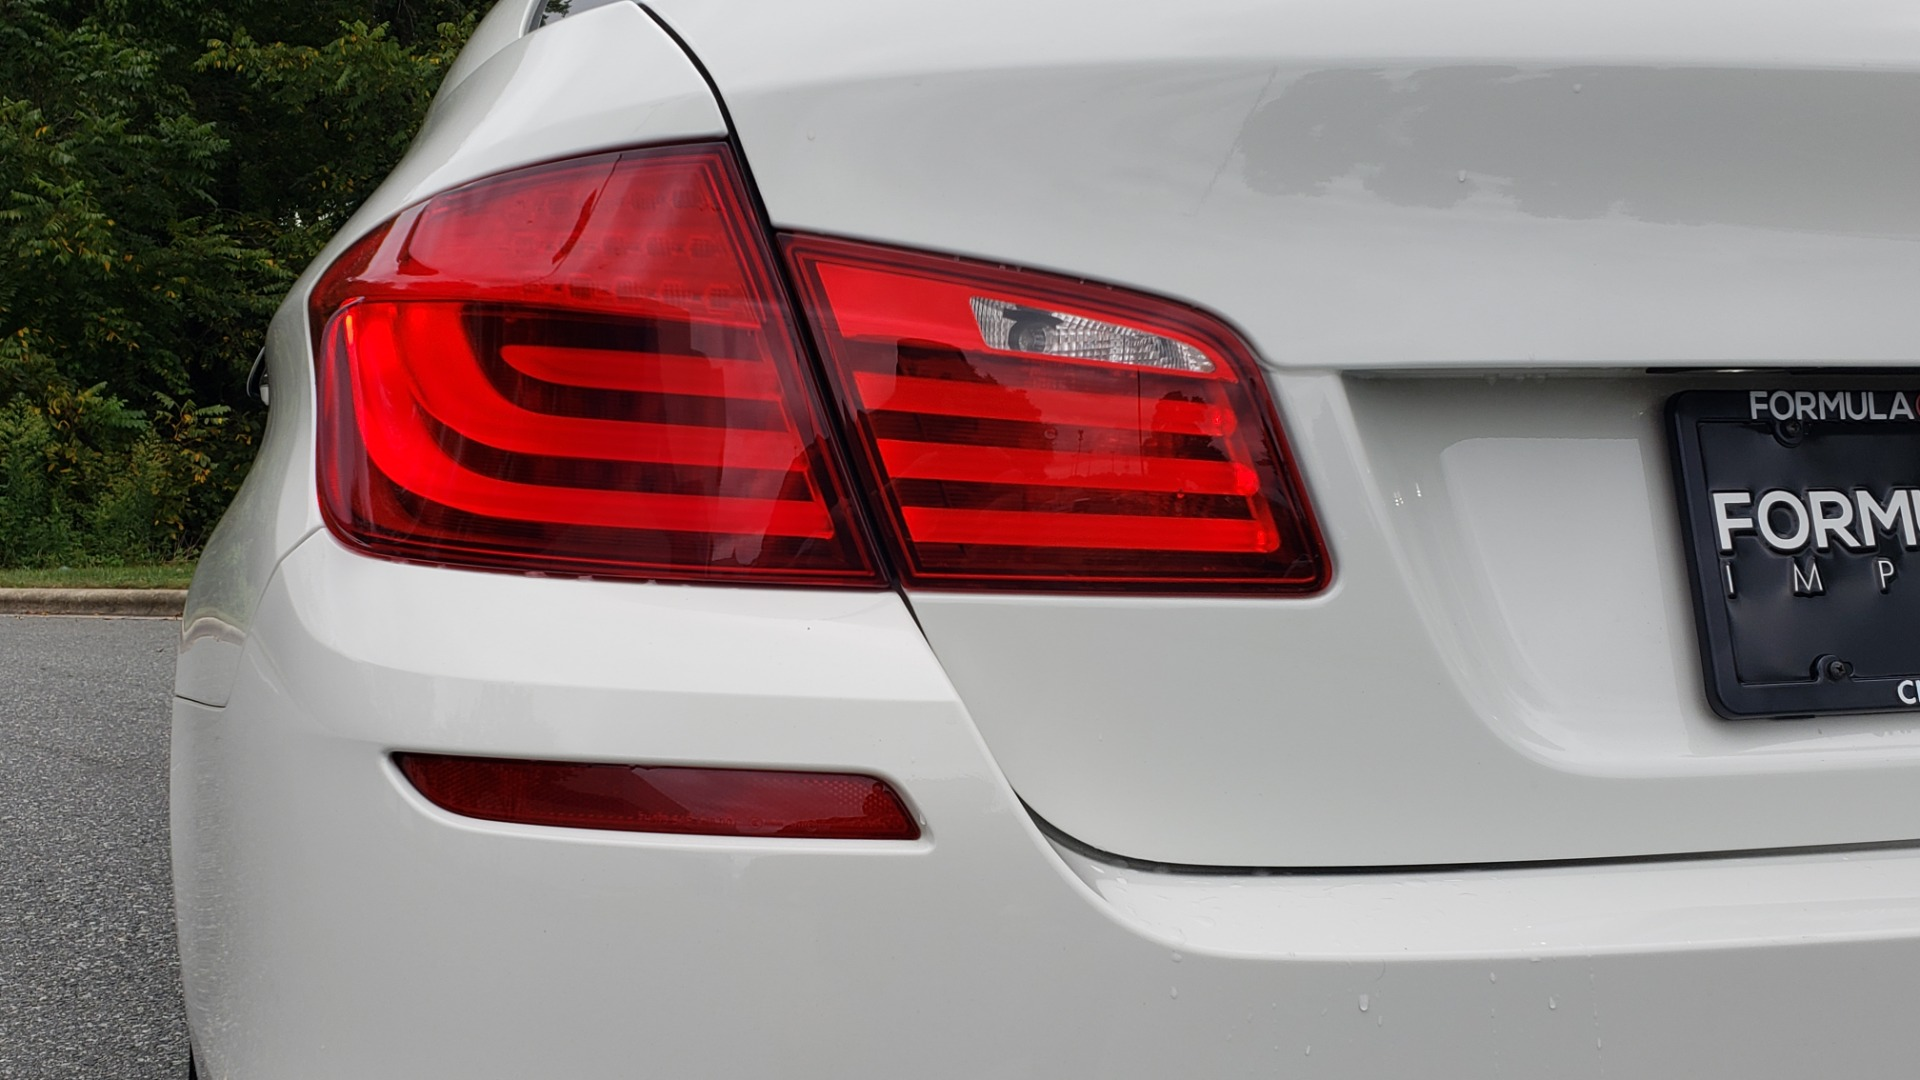 Used 2012 BMW 5 SERIES 550I M SPORT / NAV / CONV PKG / SUNROOF / PREM SND / REARVIEW for sale Sold at Formula Imports in Charlotte NC 28227 25